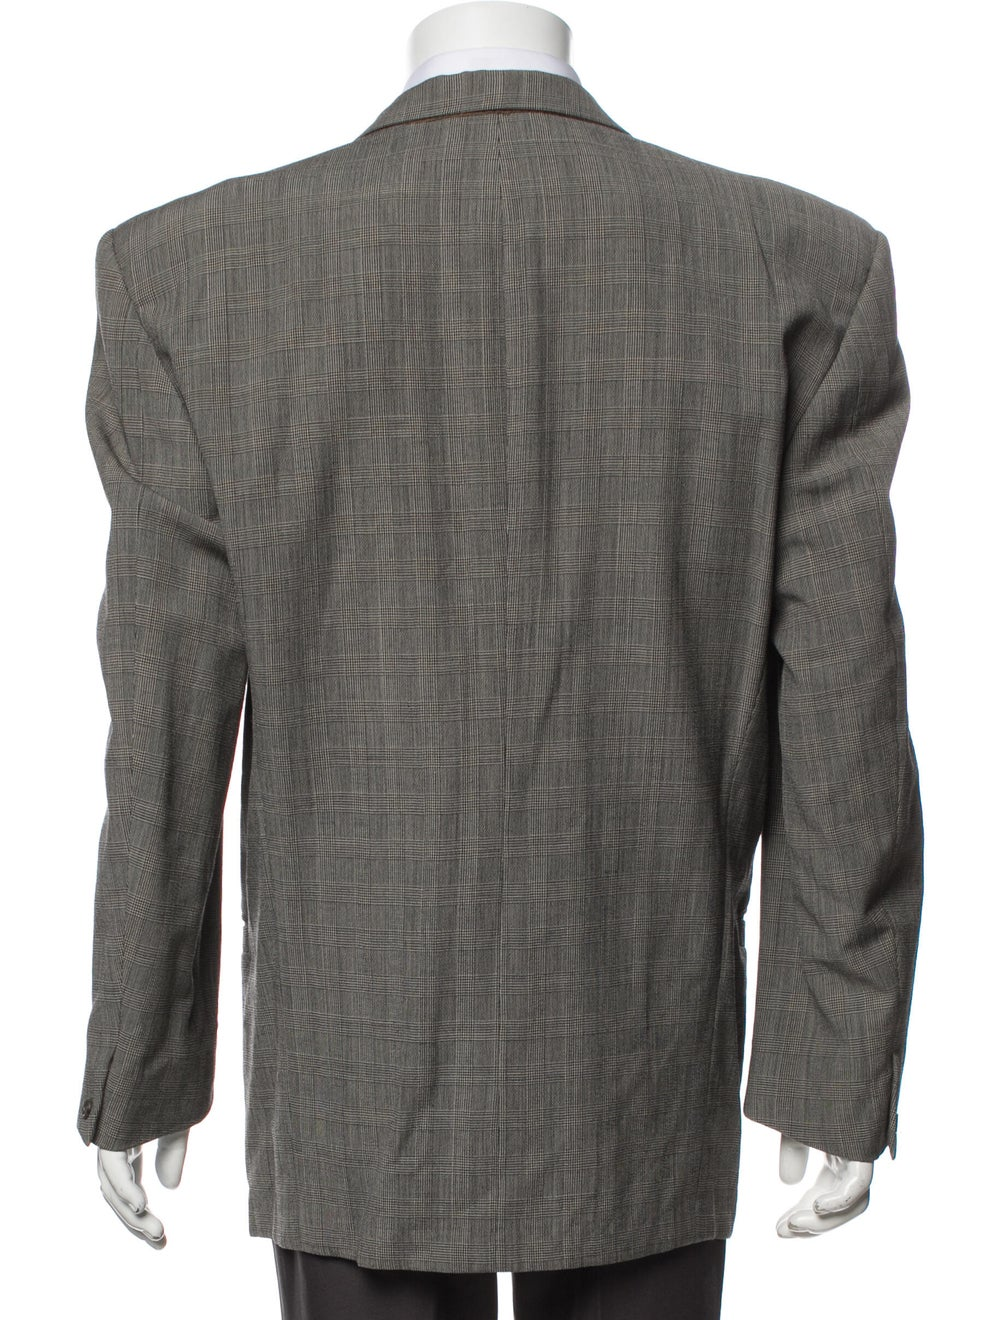 Gianni Versace Blazer - image 3